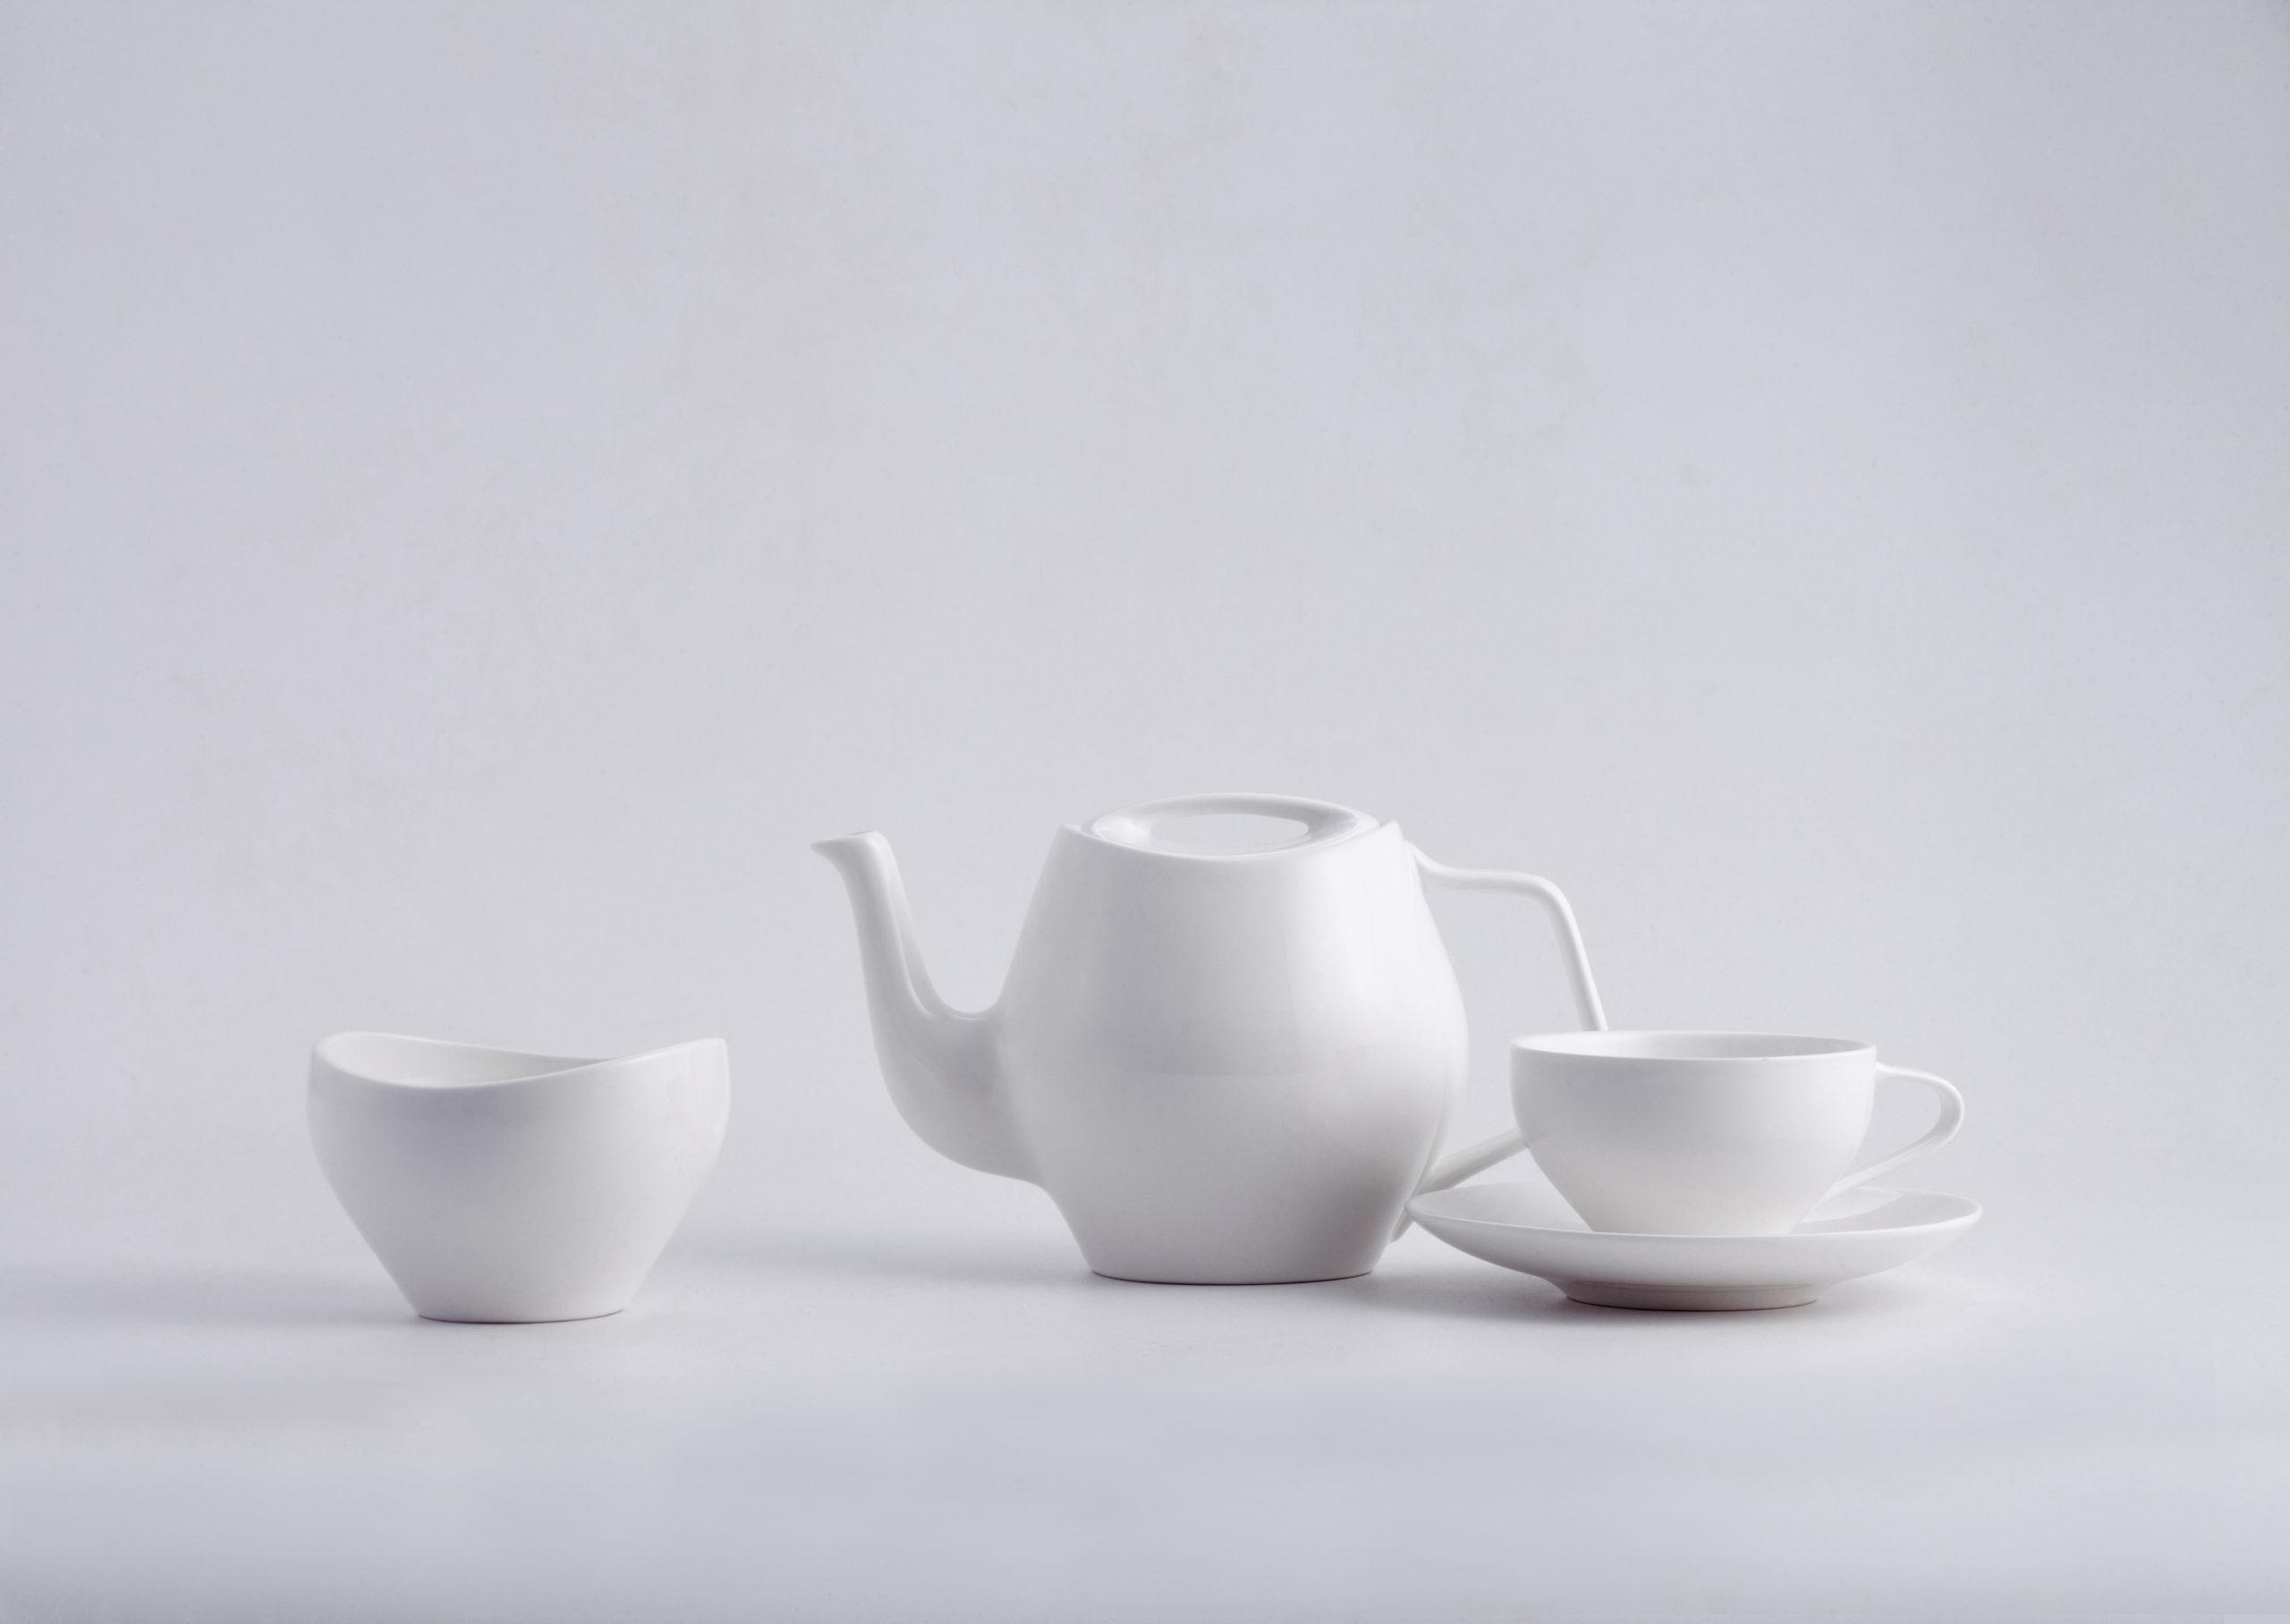 Architectmade-FJ-Essence-Tea-set-Porcelain-Finn-Juhl-1